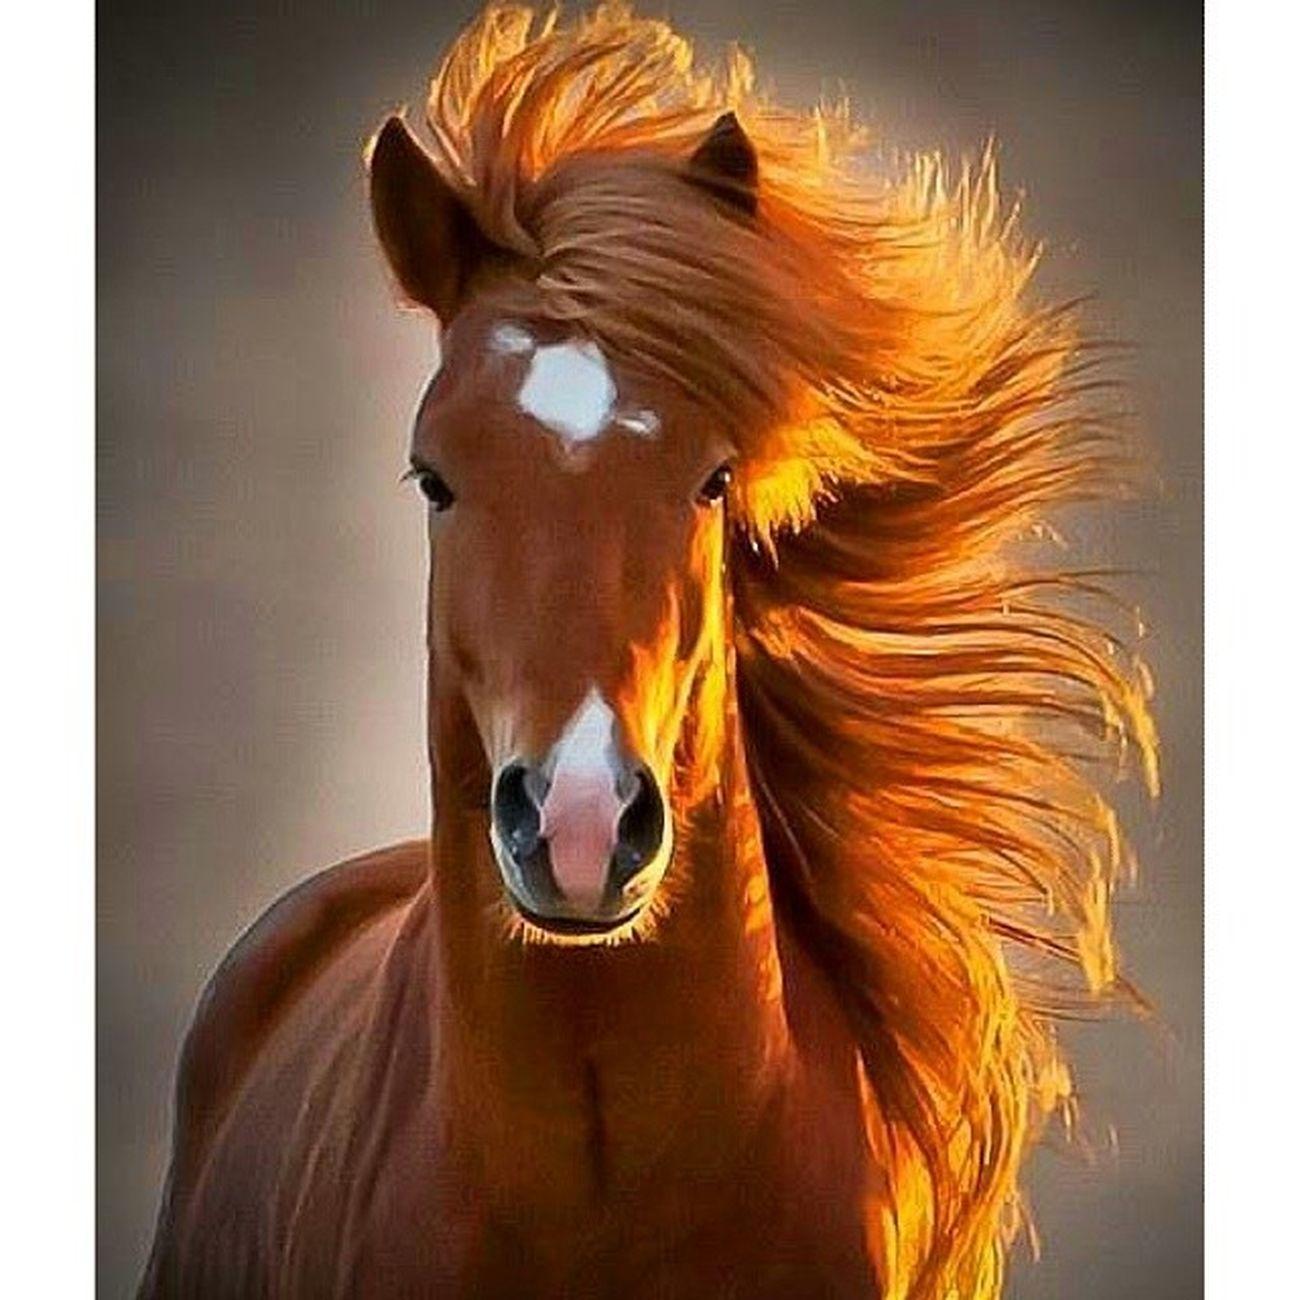 At Asalet Guzellik GUC karizma horses nobility beauty power charisma picoftheday